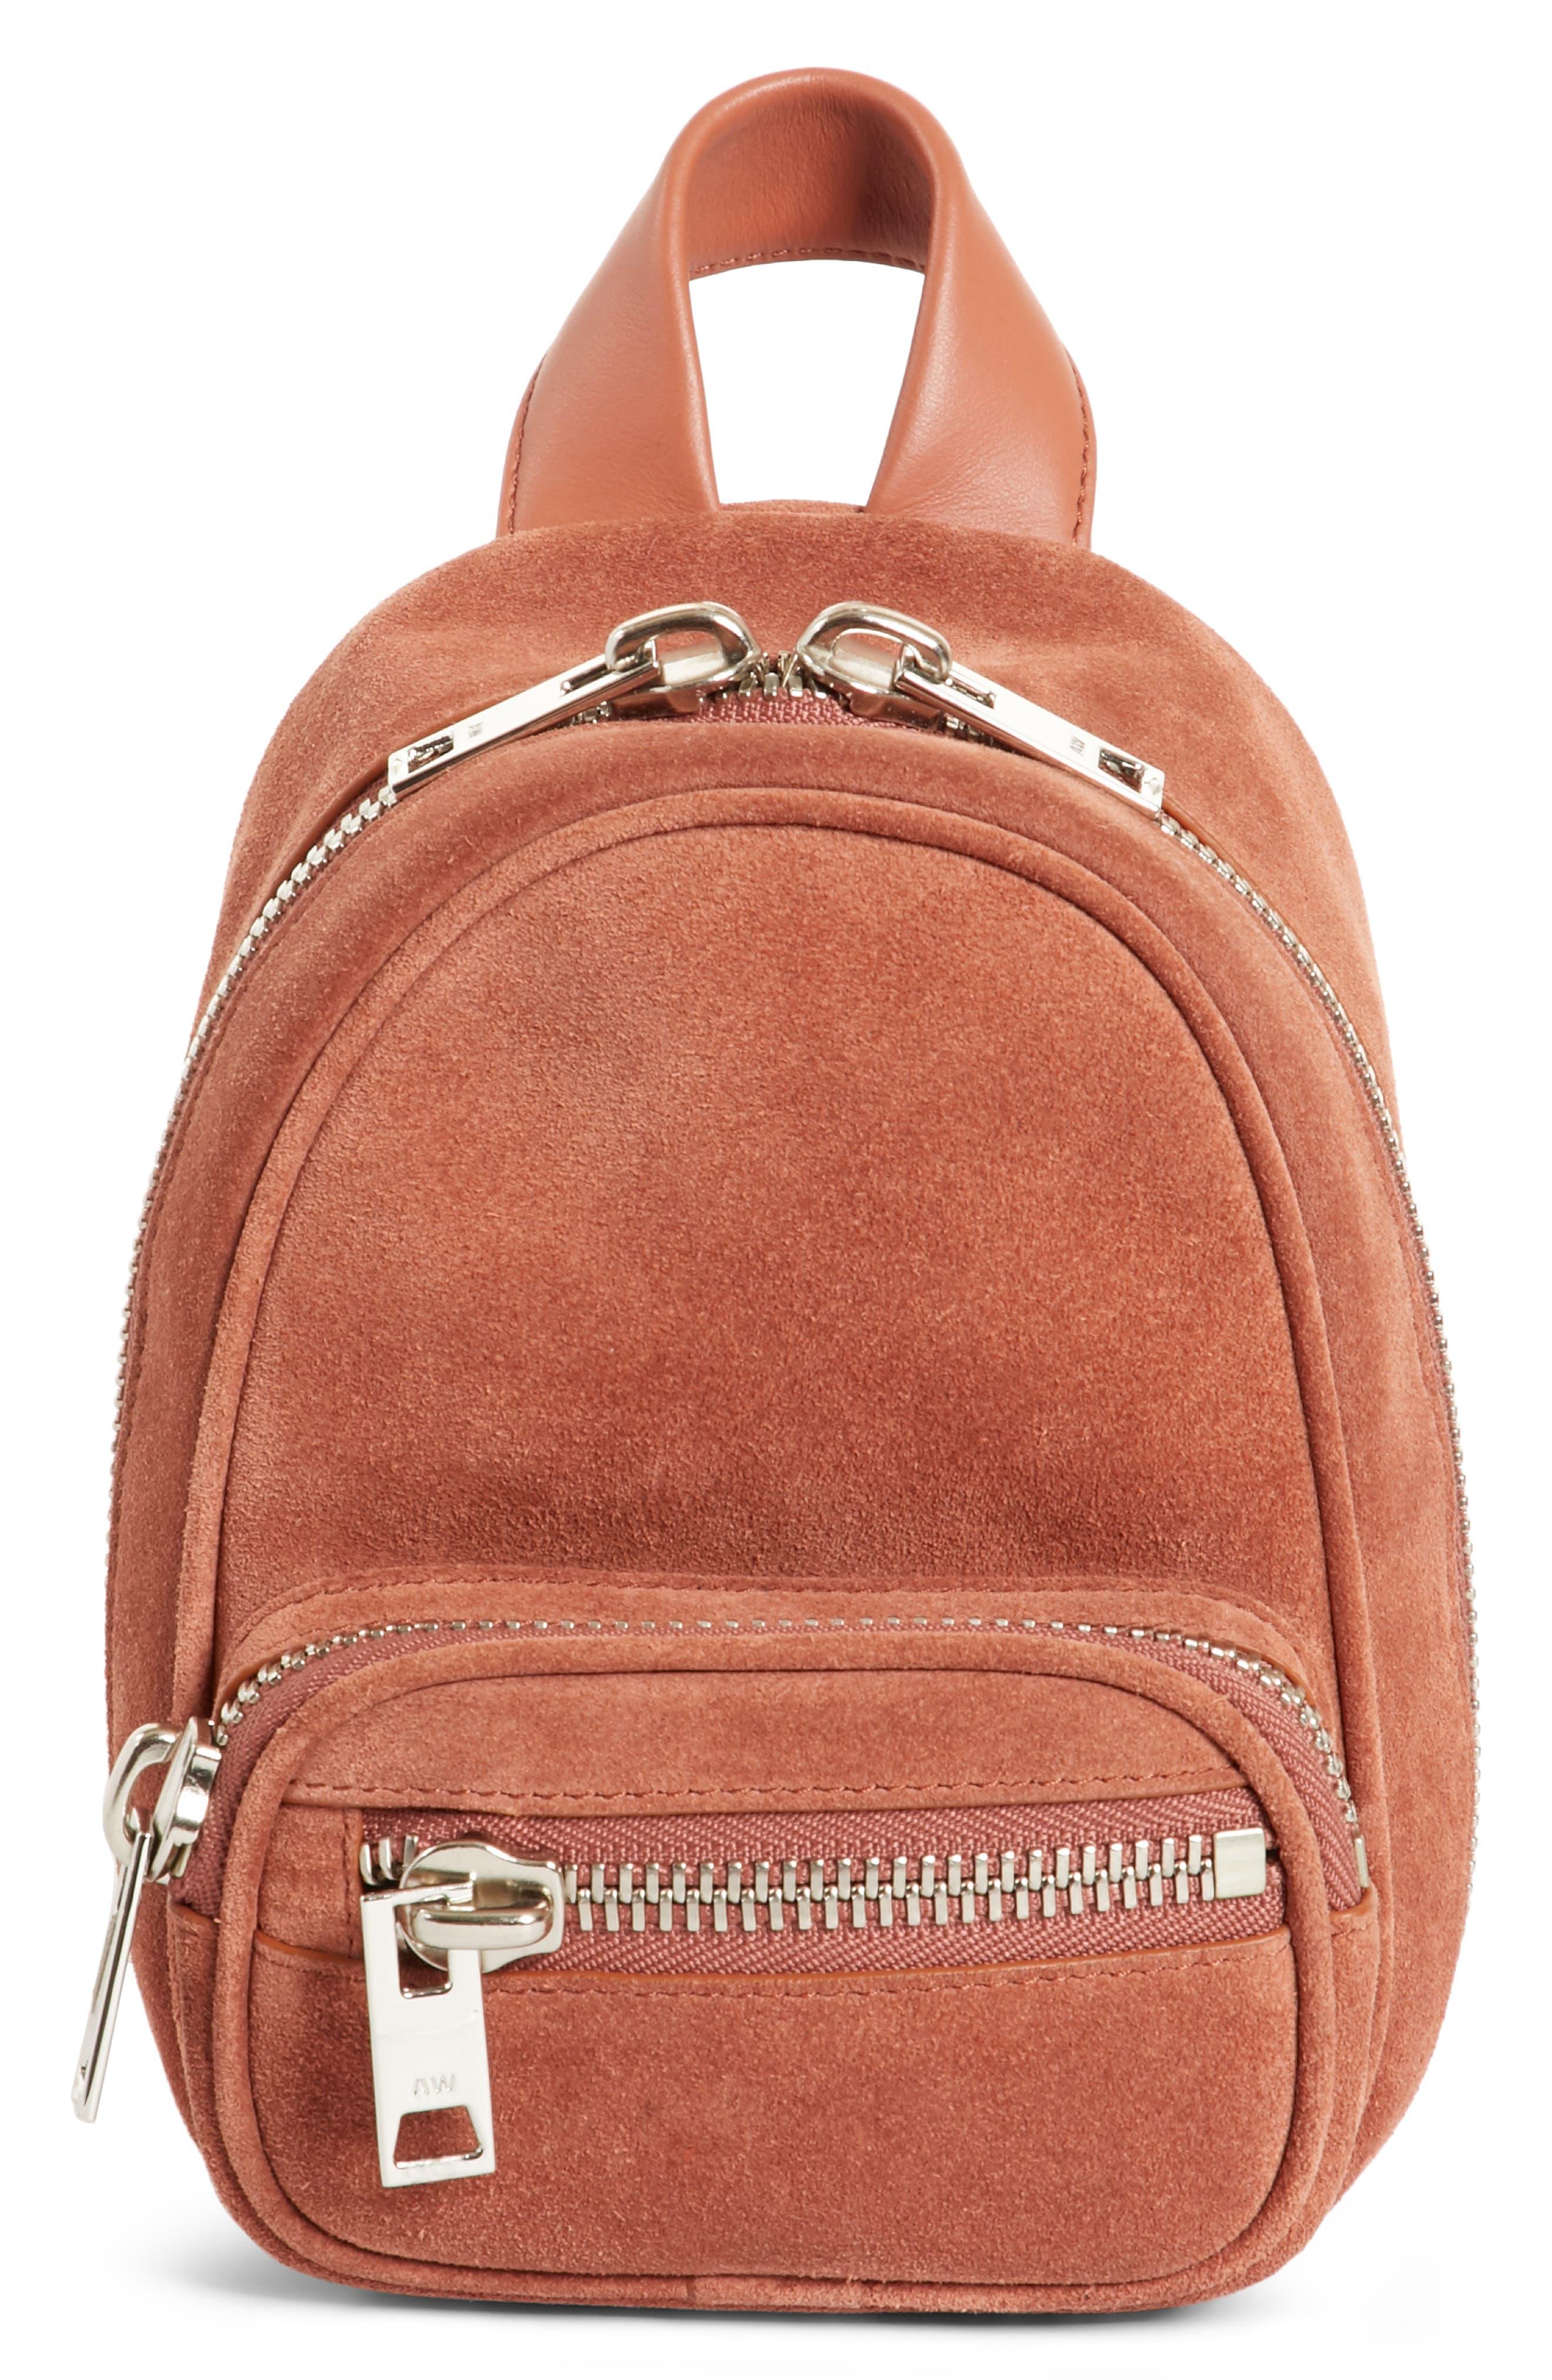 Mini Attica Suede Backpack-Shaped Crossbody Bag,                             Main thumbnail 1, color,                             200